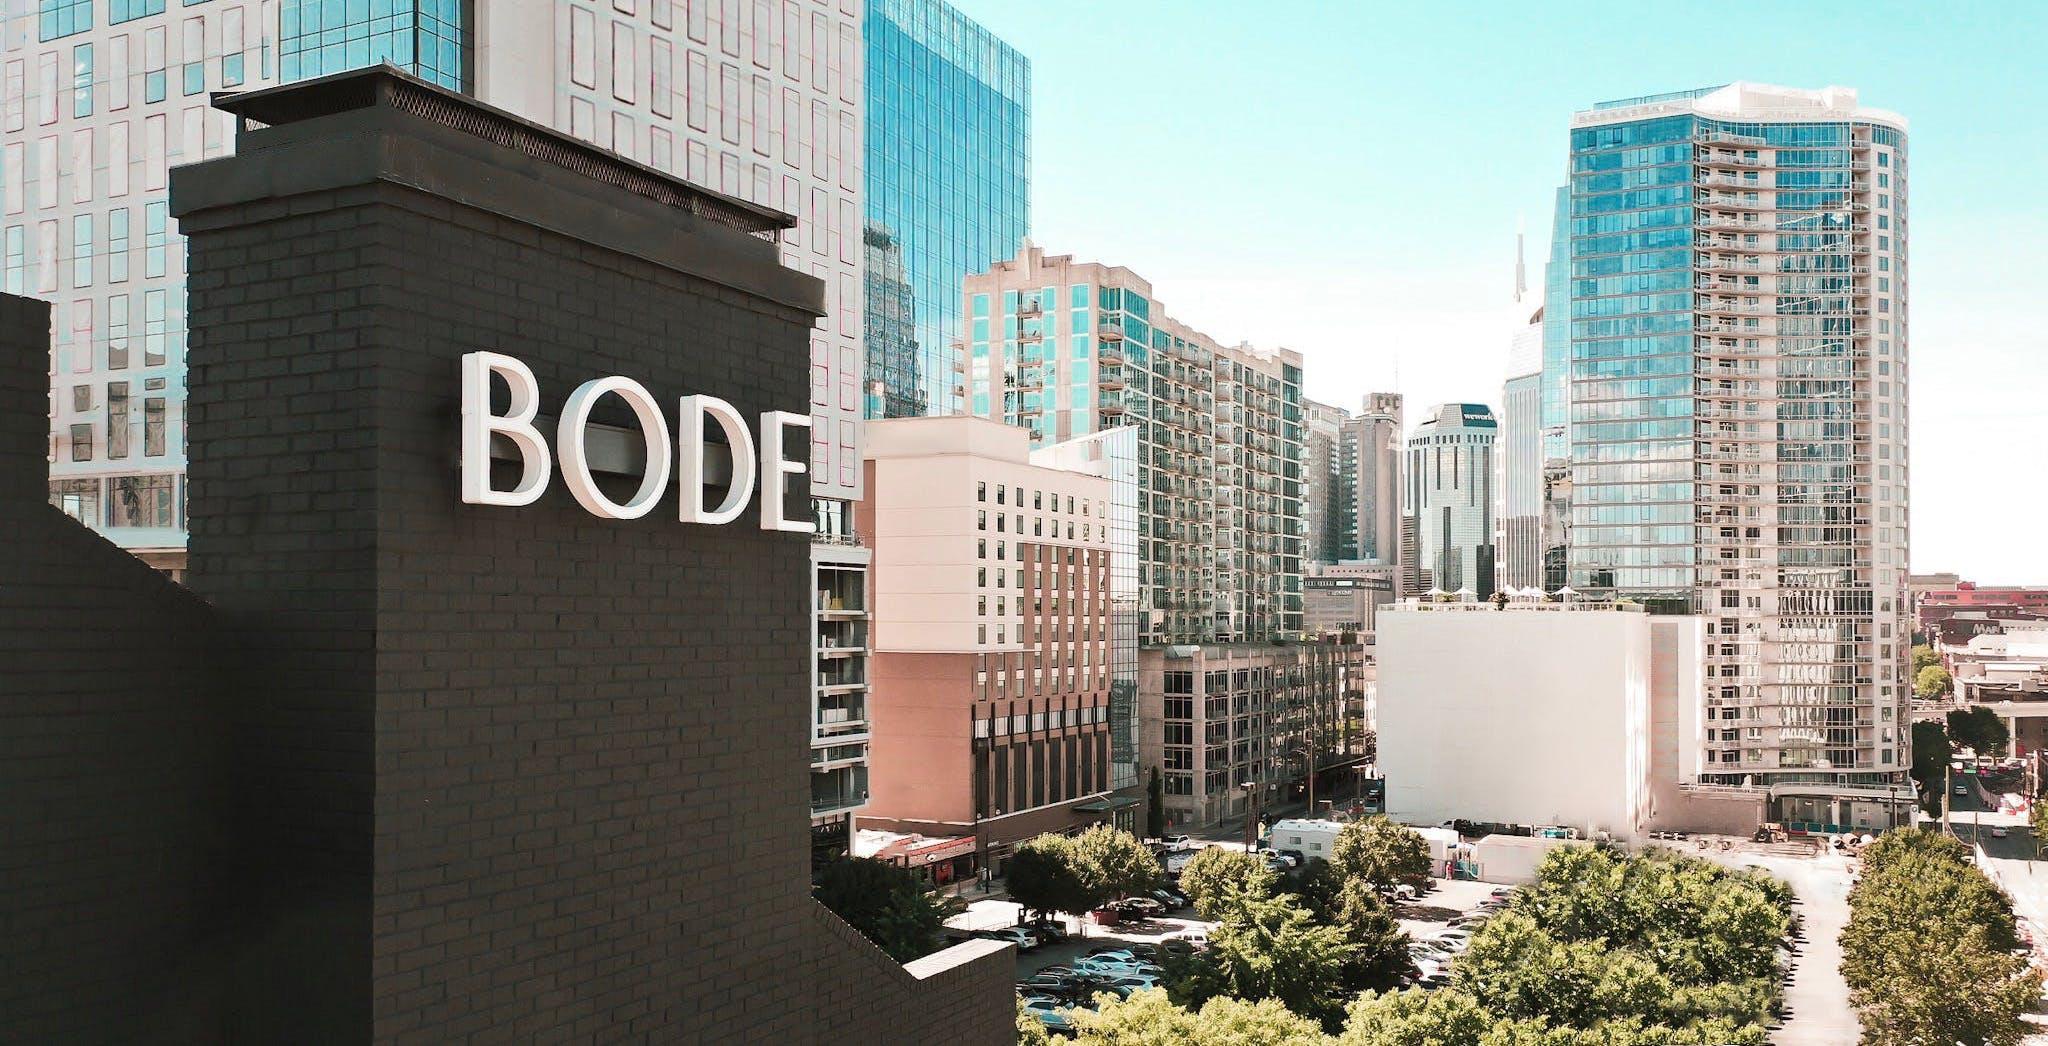 Bode Building Image